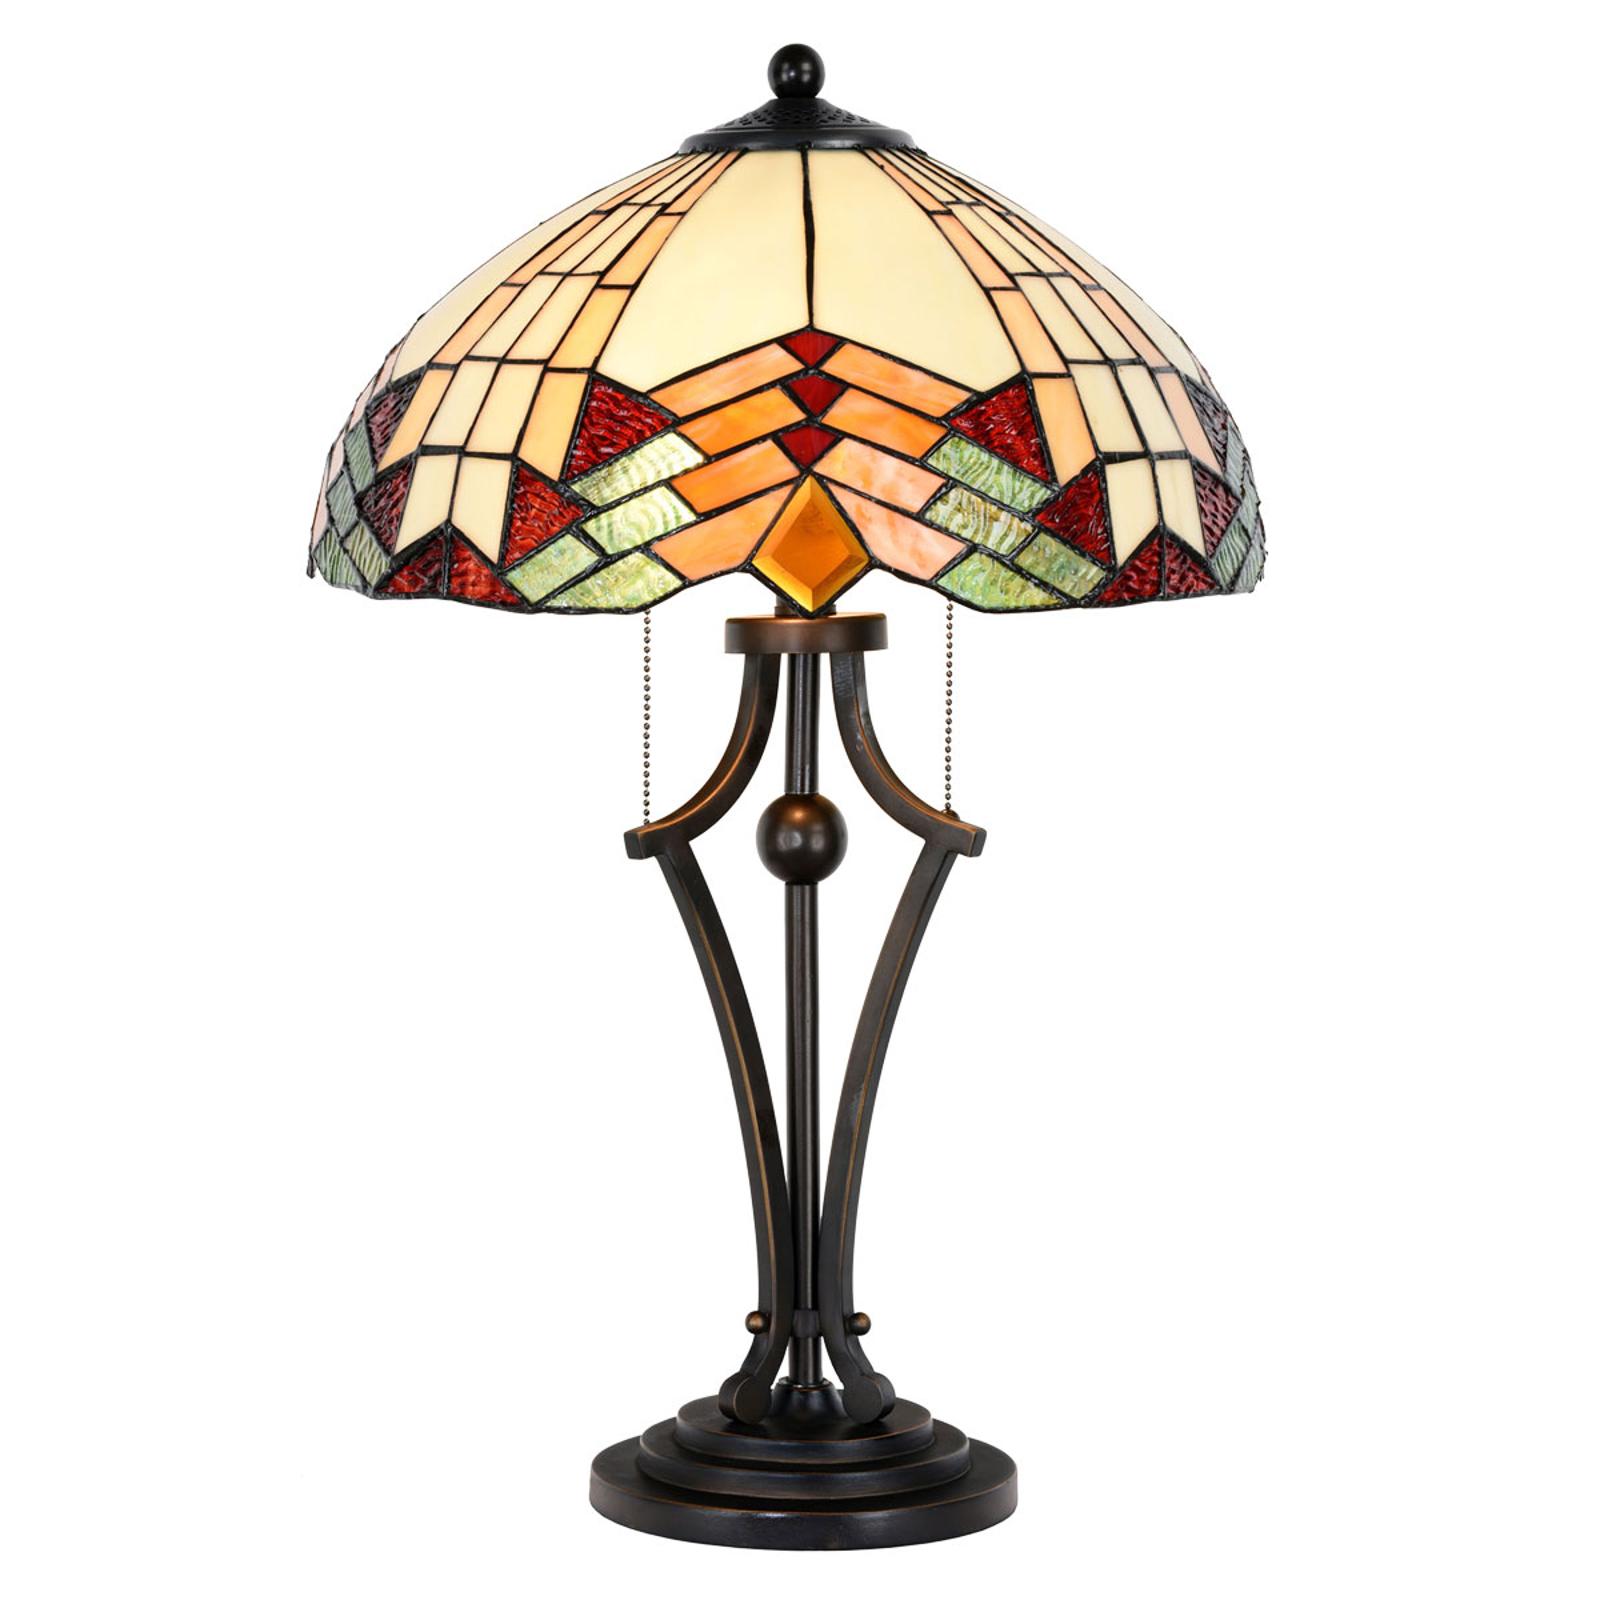 Bordlampe 5961 i tiffanylook med farverigt glas